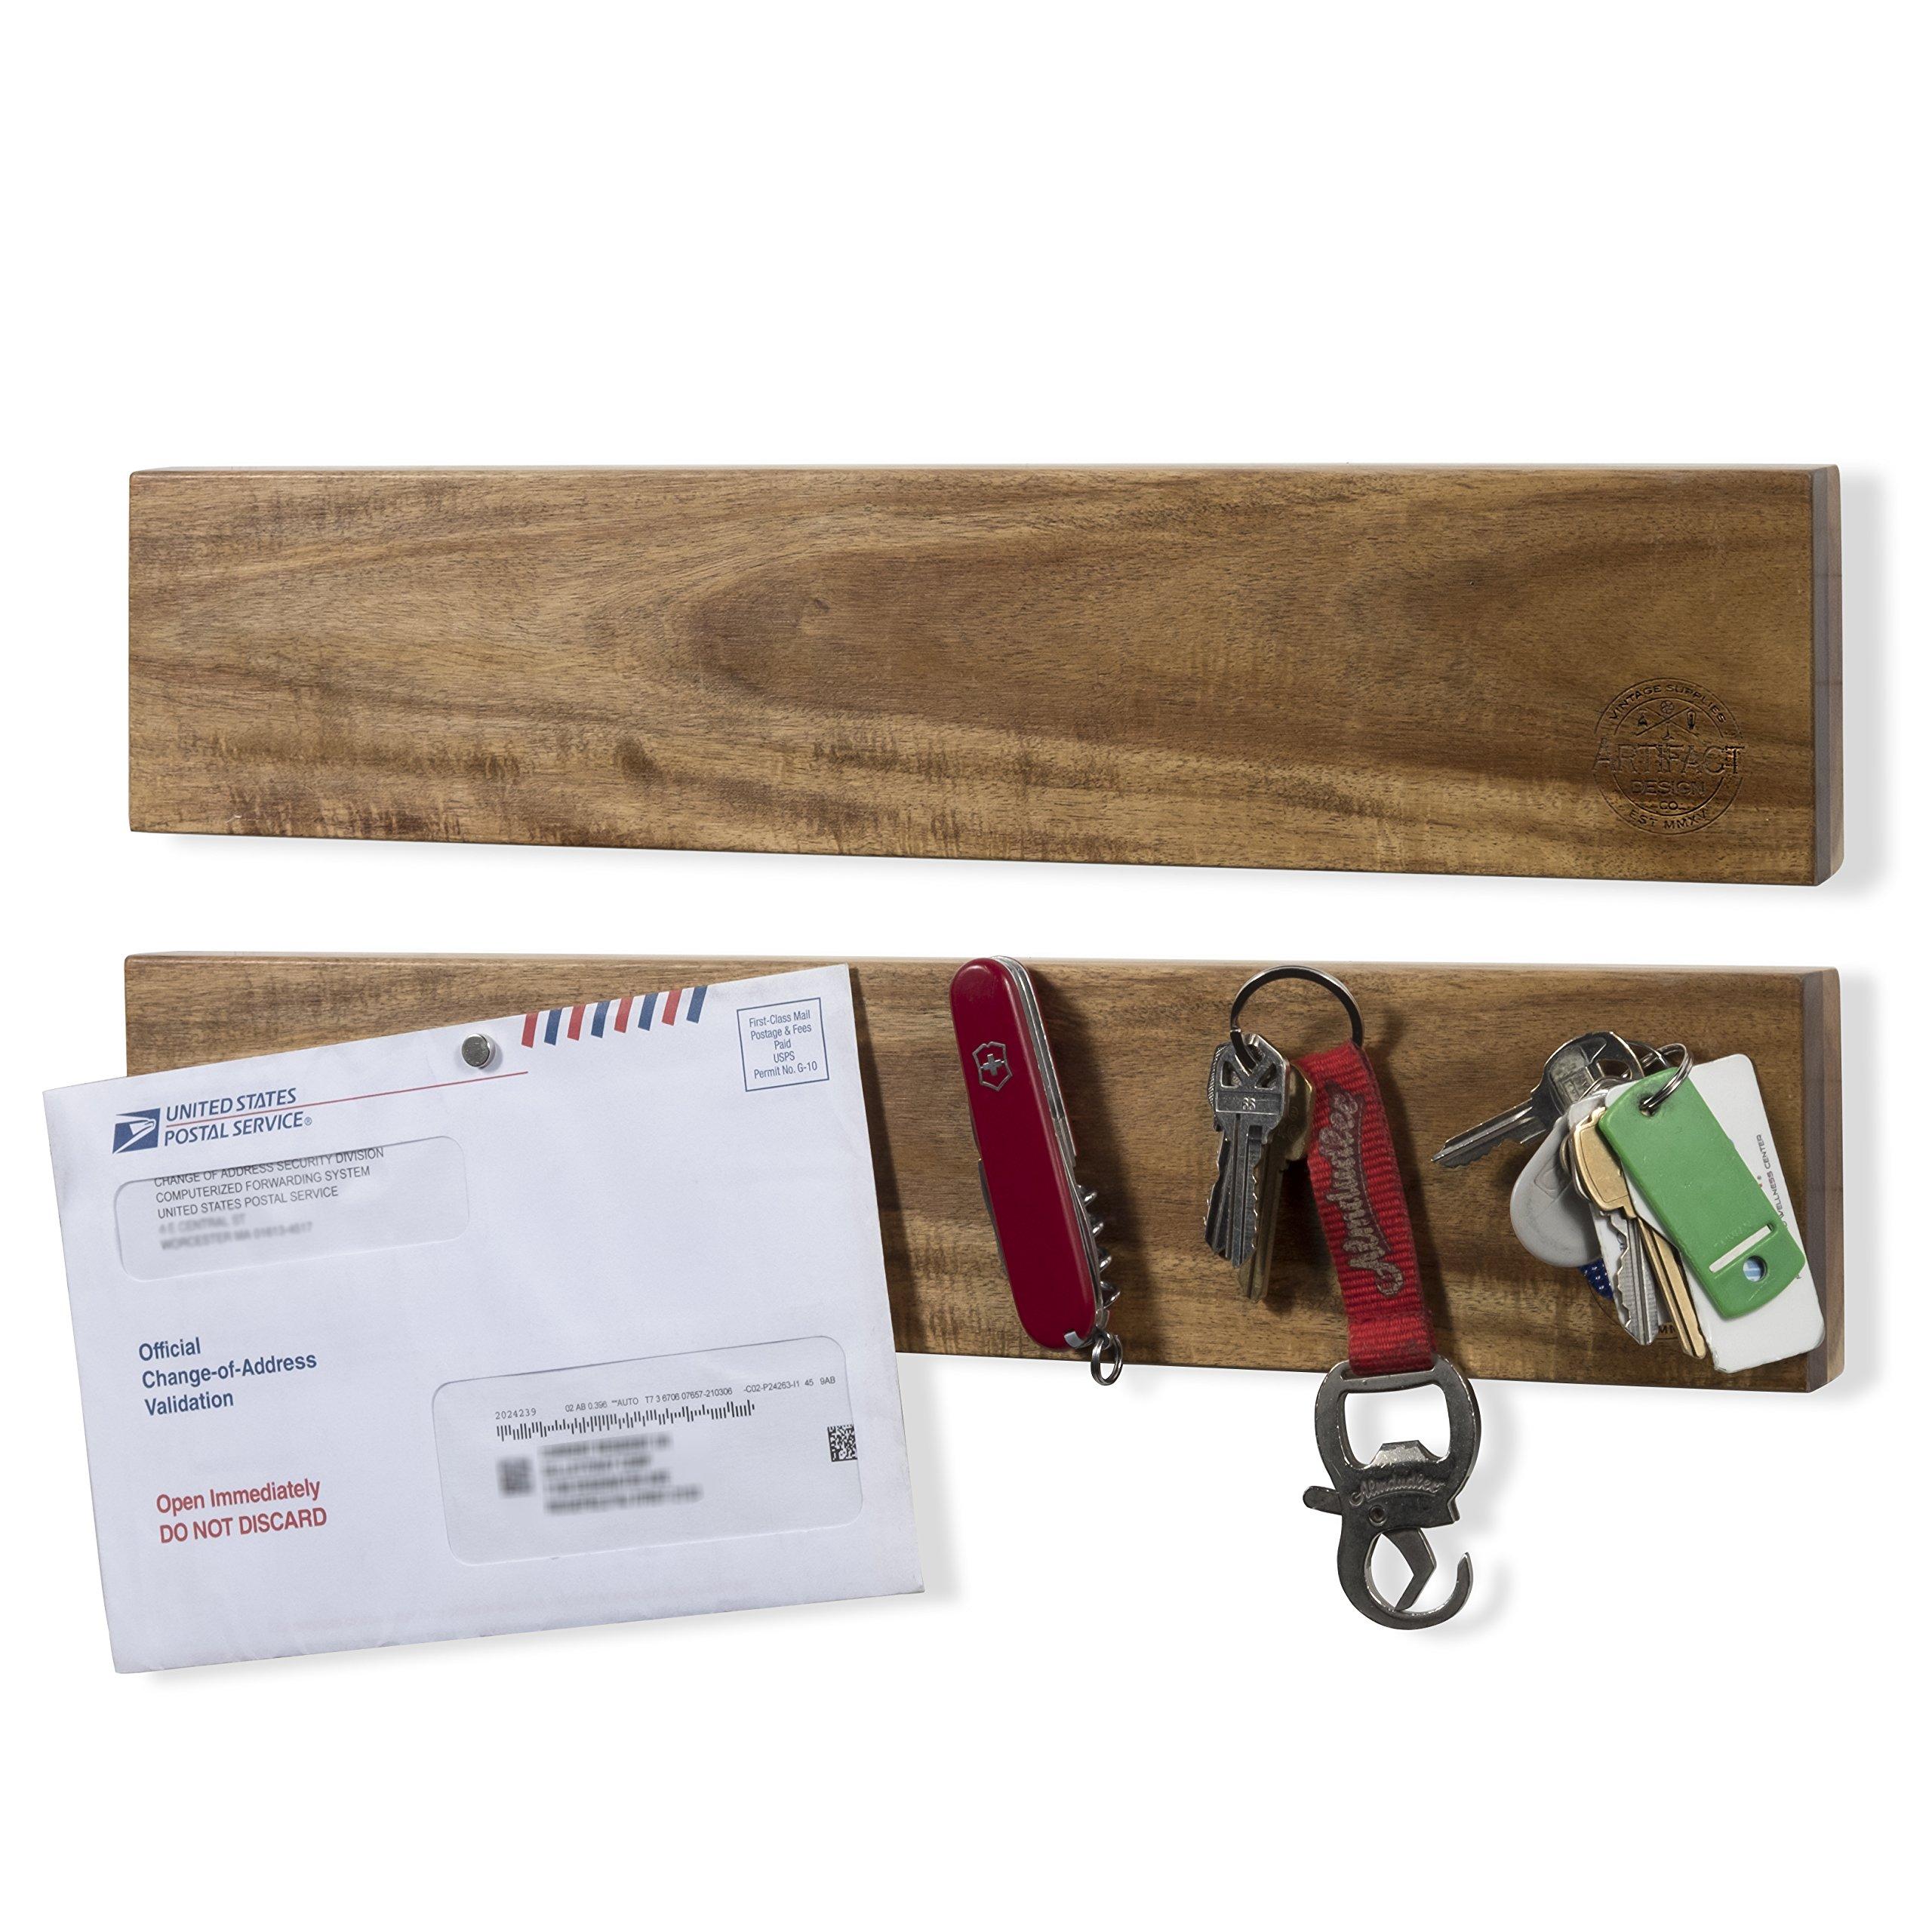 ArtifactDesign Strong Grip Magnetic Entryway or Foyer Wall Mountable Bar Key Holder Set of 2 Walnut